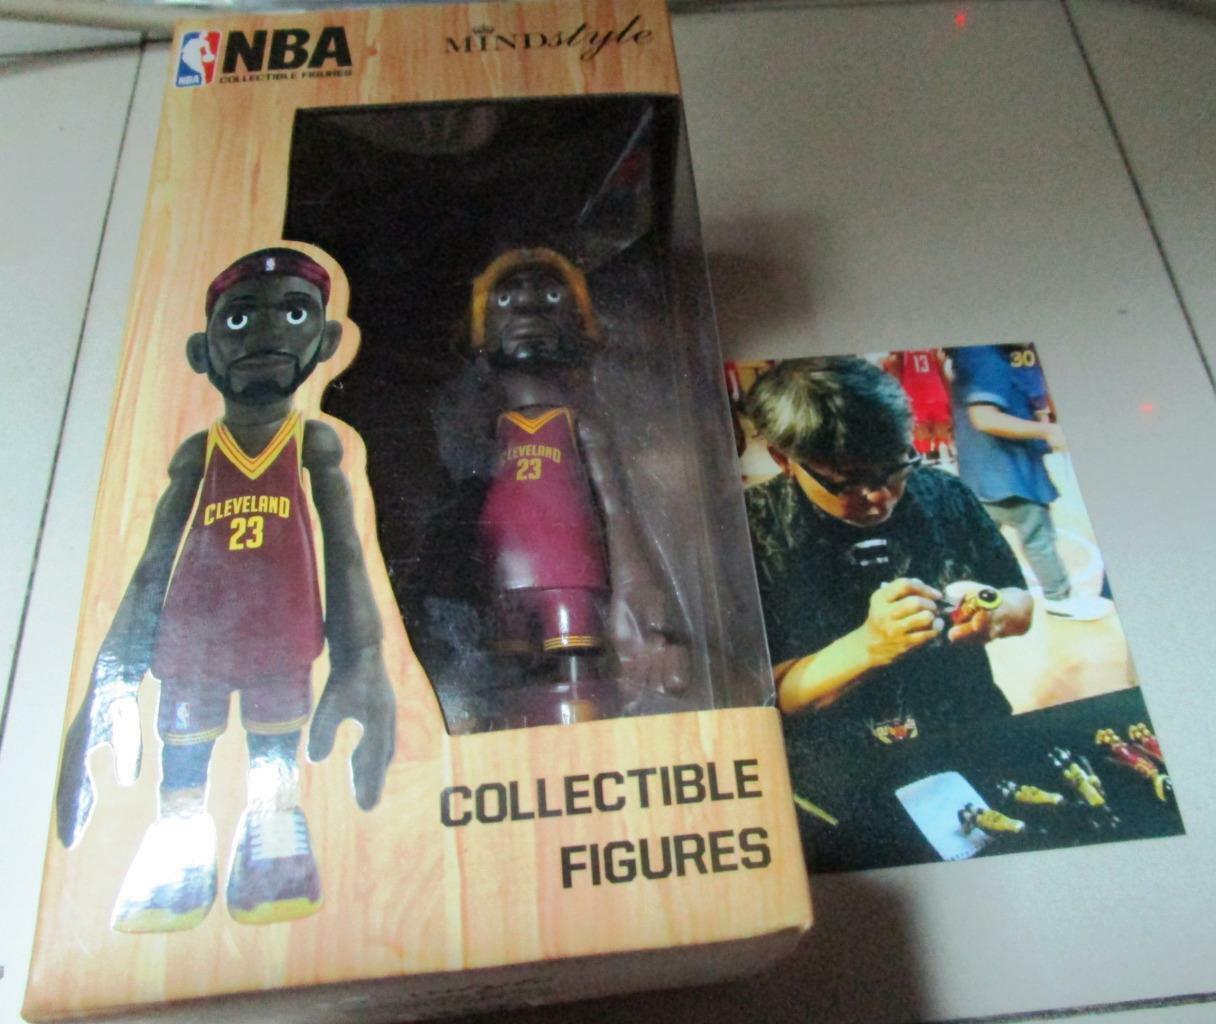 2015 NBA Lebron James cifra Clevele MINDSTYLE CoolRain Studio Firmato Nuovo